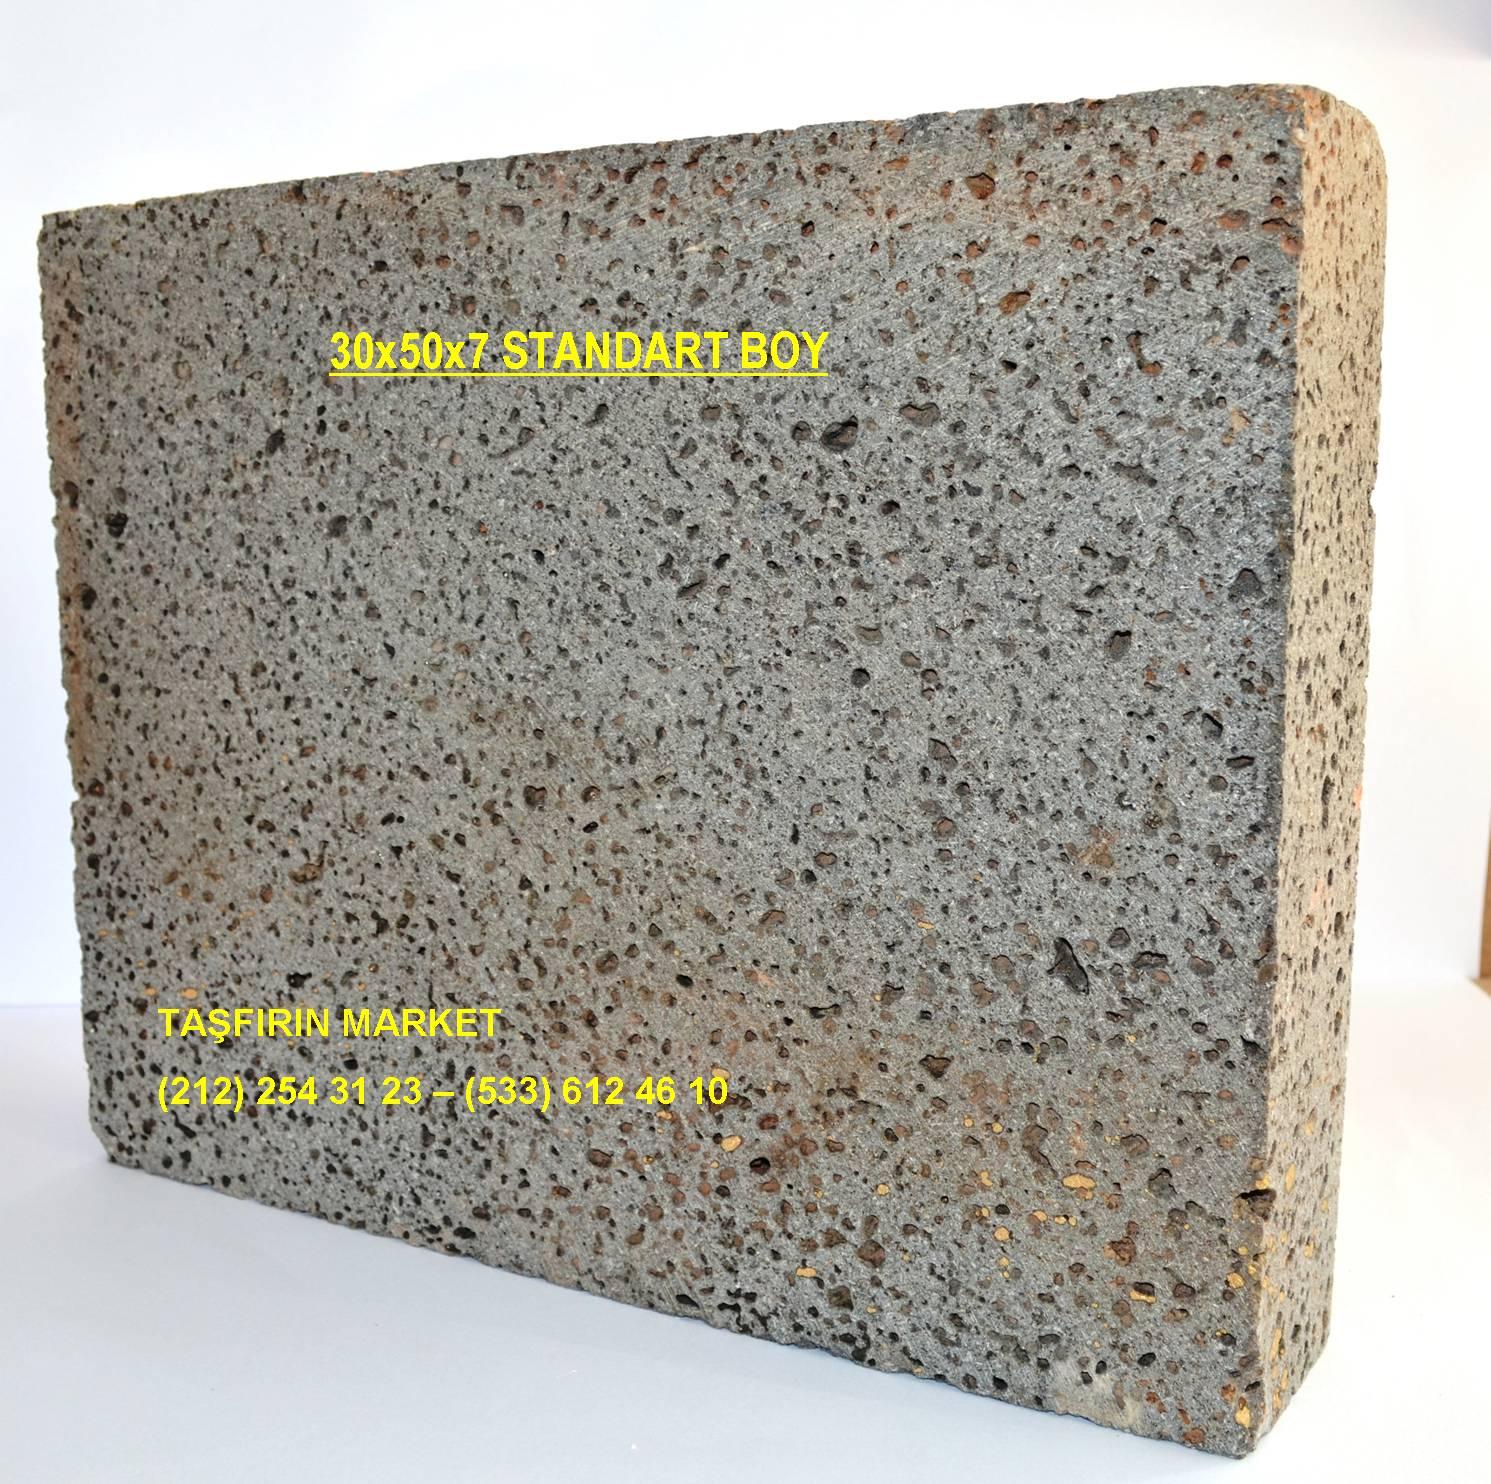 Taş fırınlar için taban taşı 30x50x7 cm standart boy